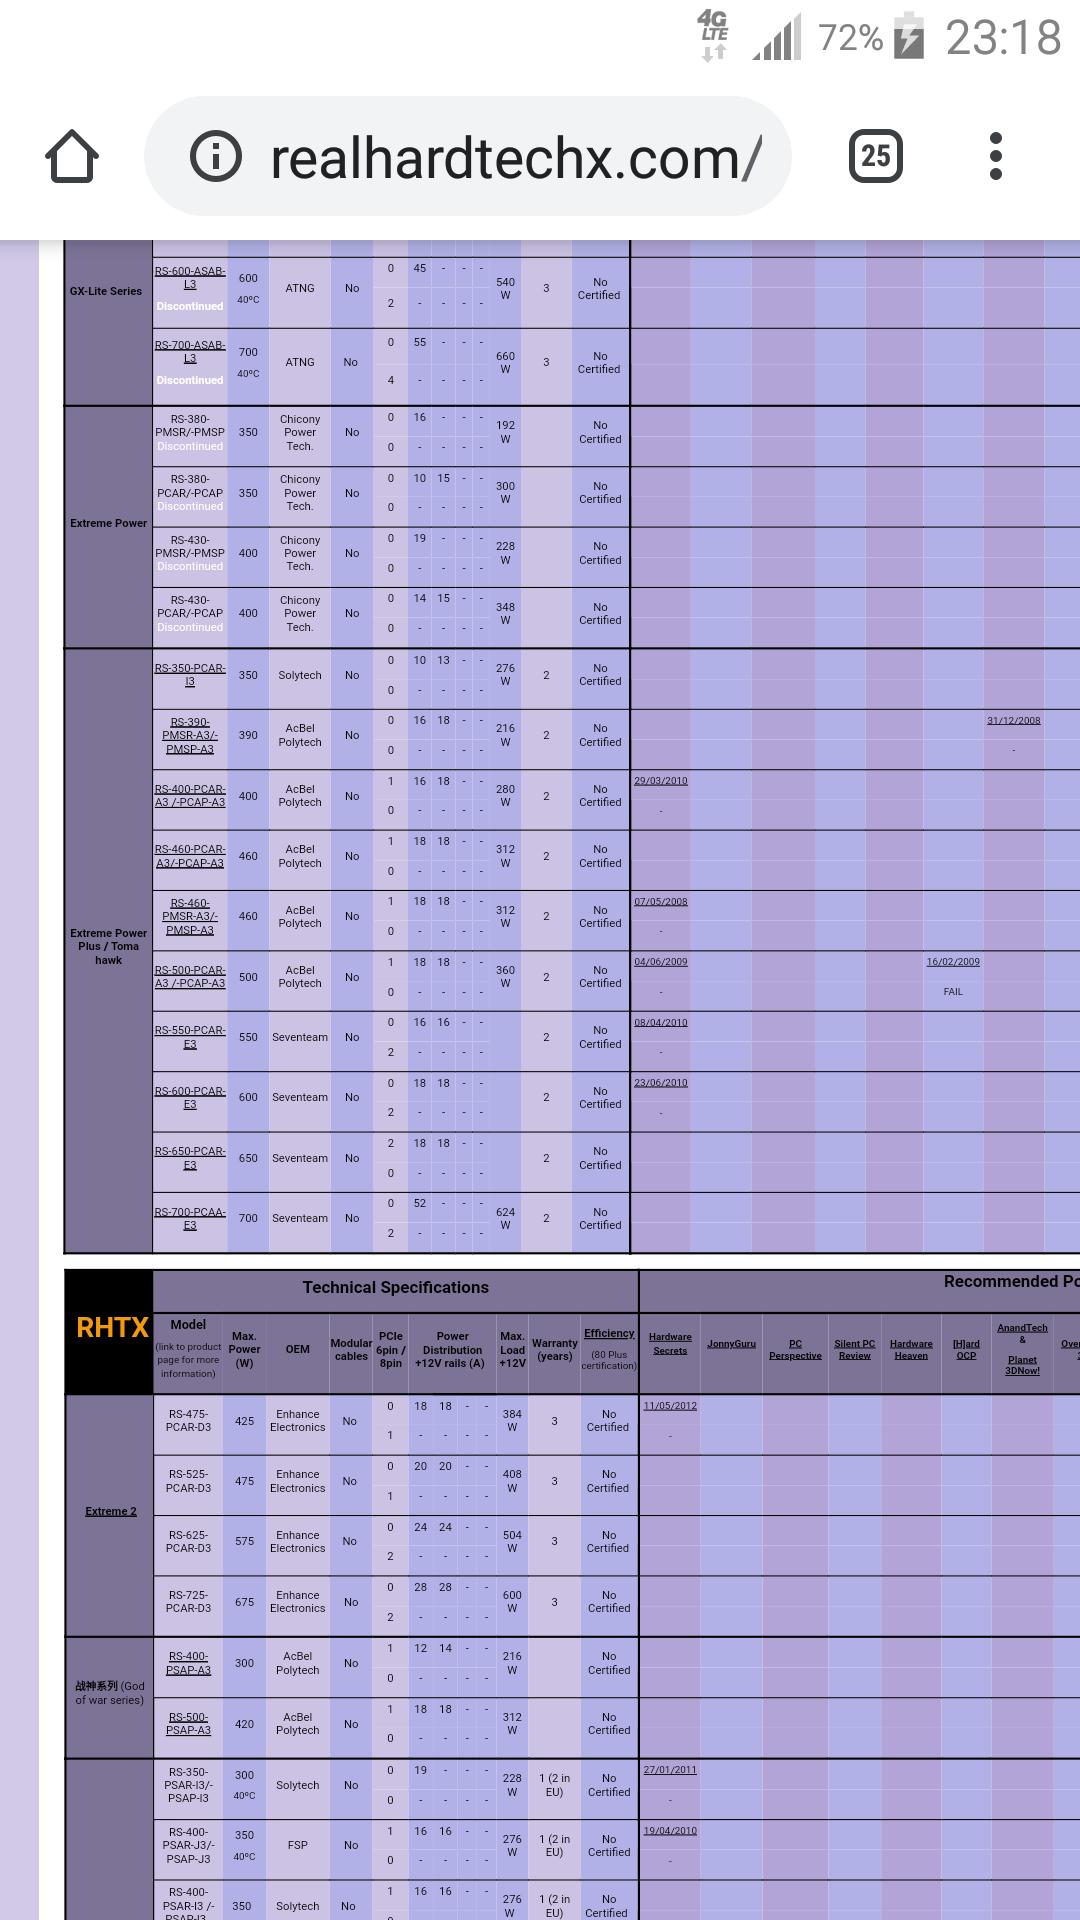 Screenshot_2020-02-16-23-18-04.png